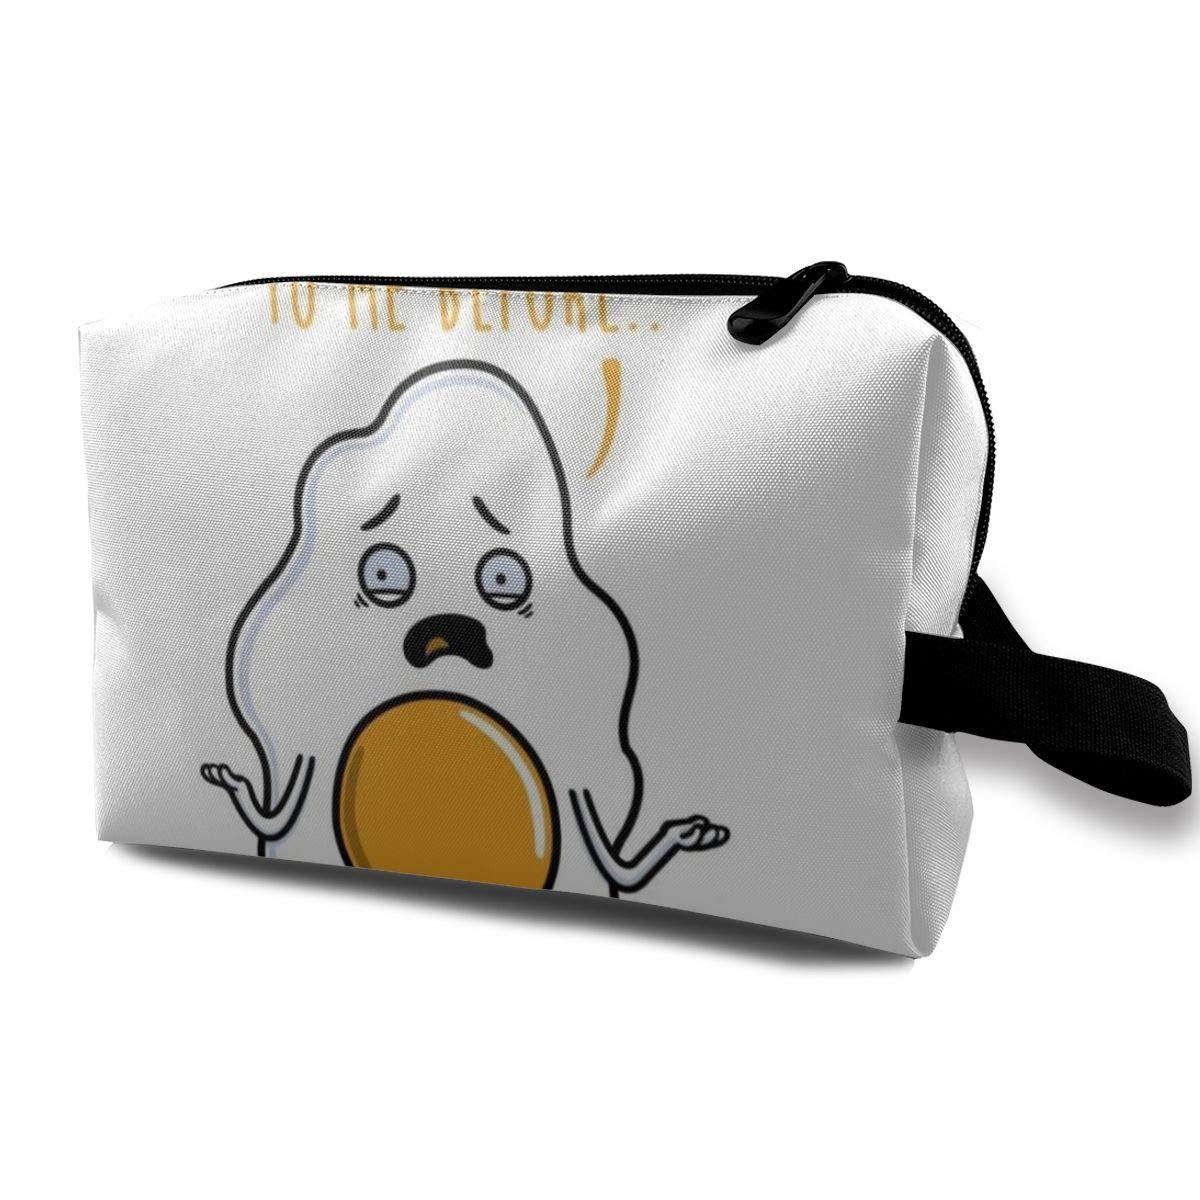 Makeup Bag Cosmetic Pouch Premature Eggjaculation Multi-Functional Bag Travel Kit Storage Bag